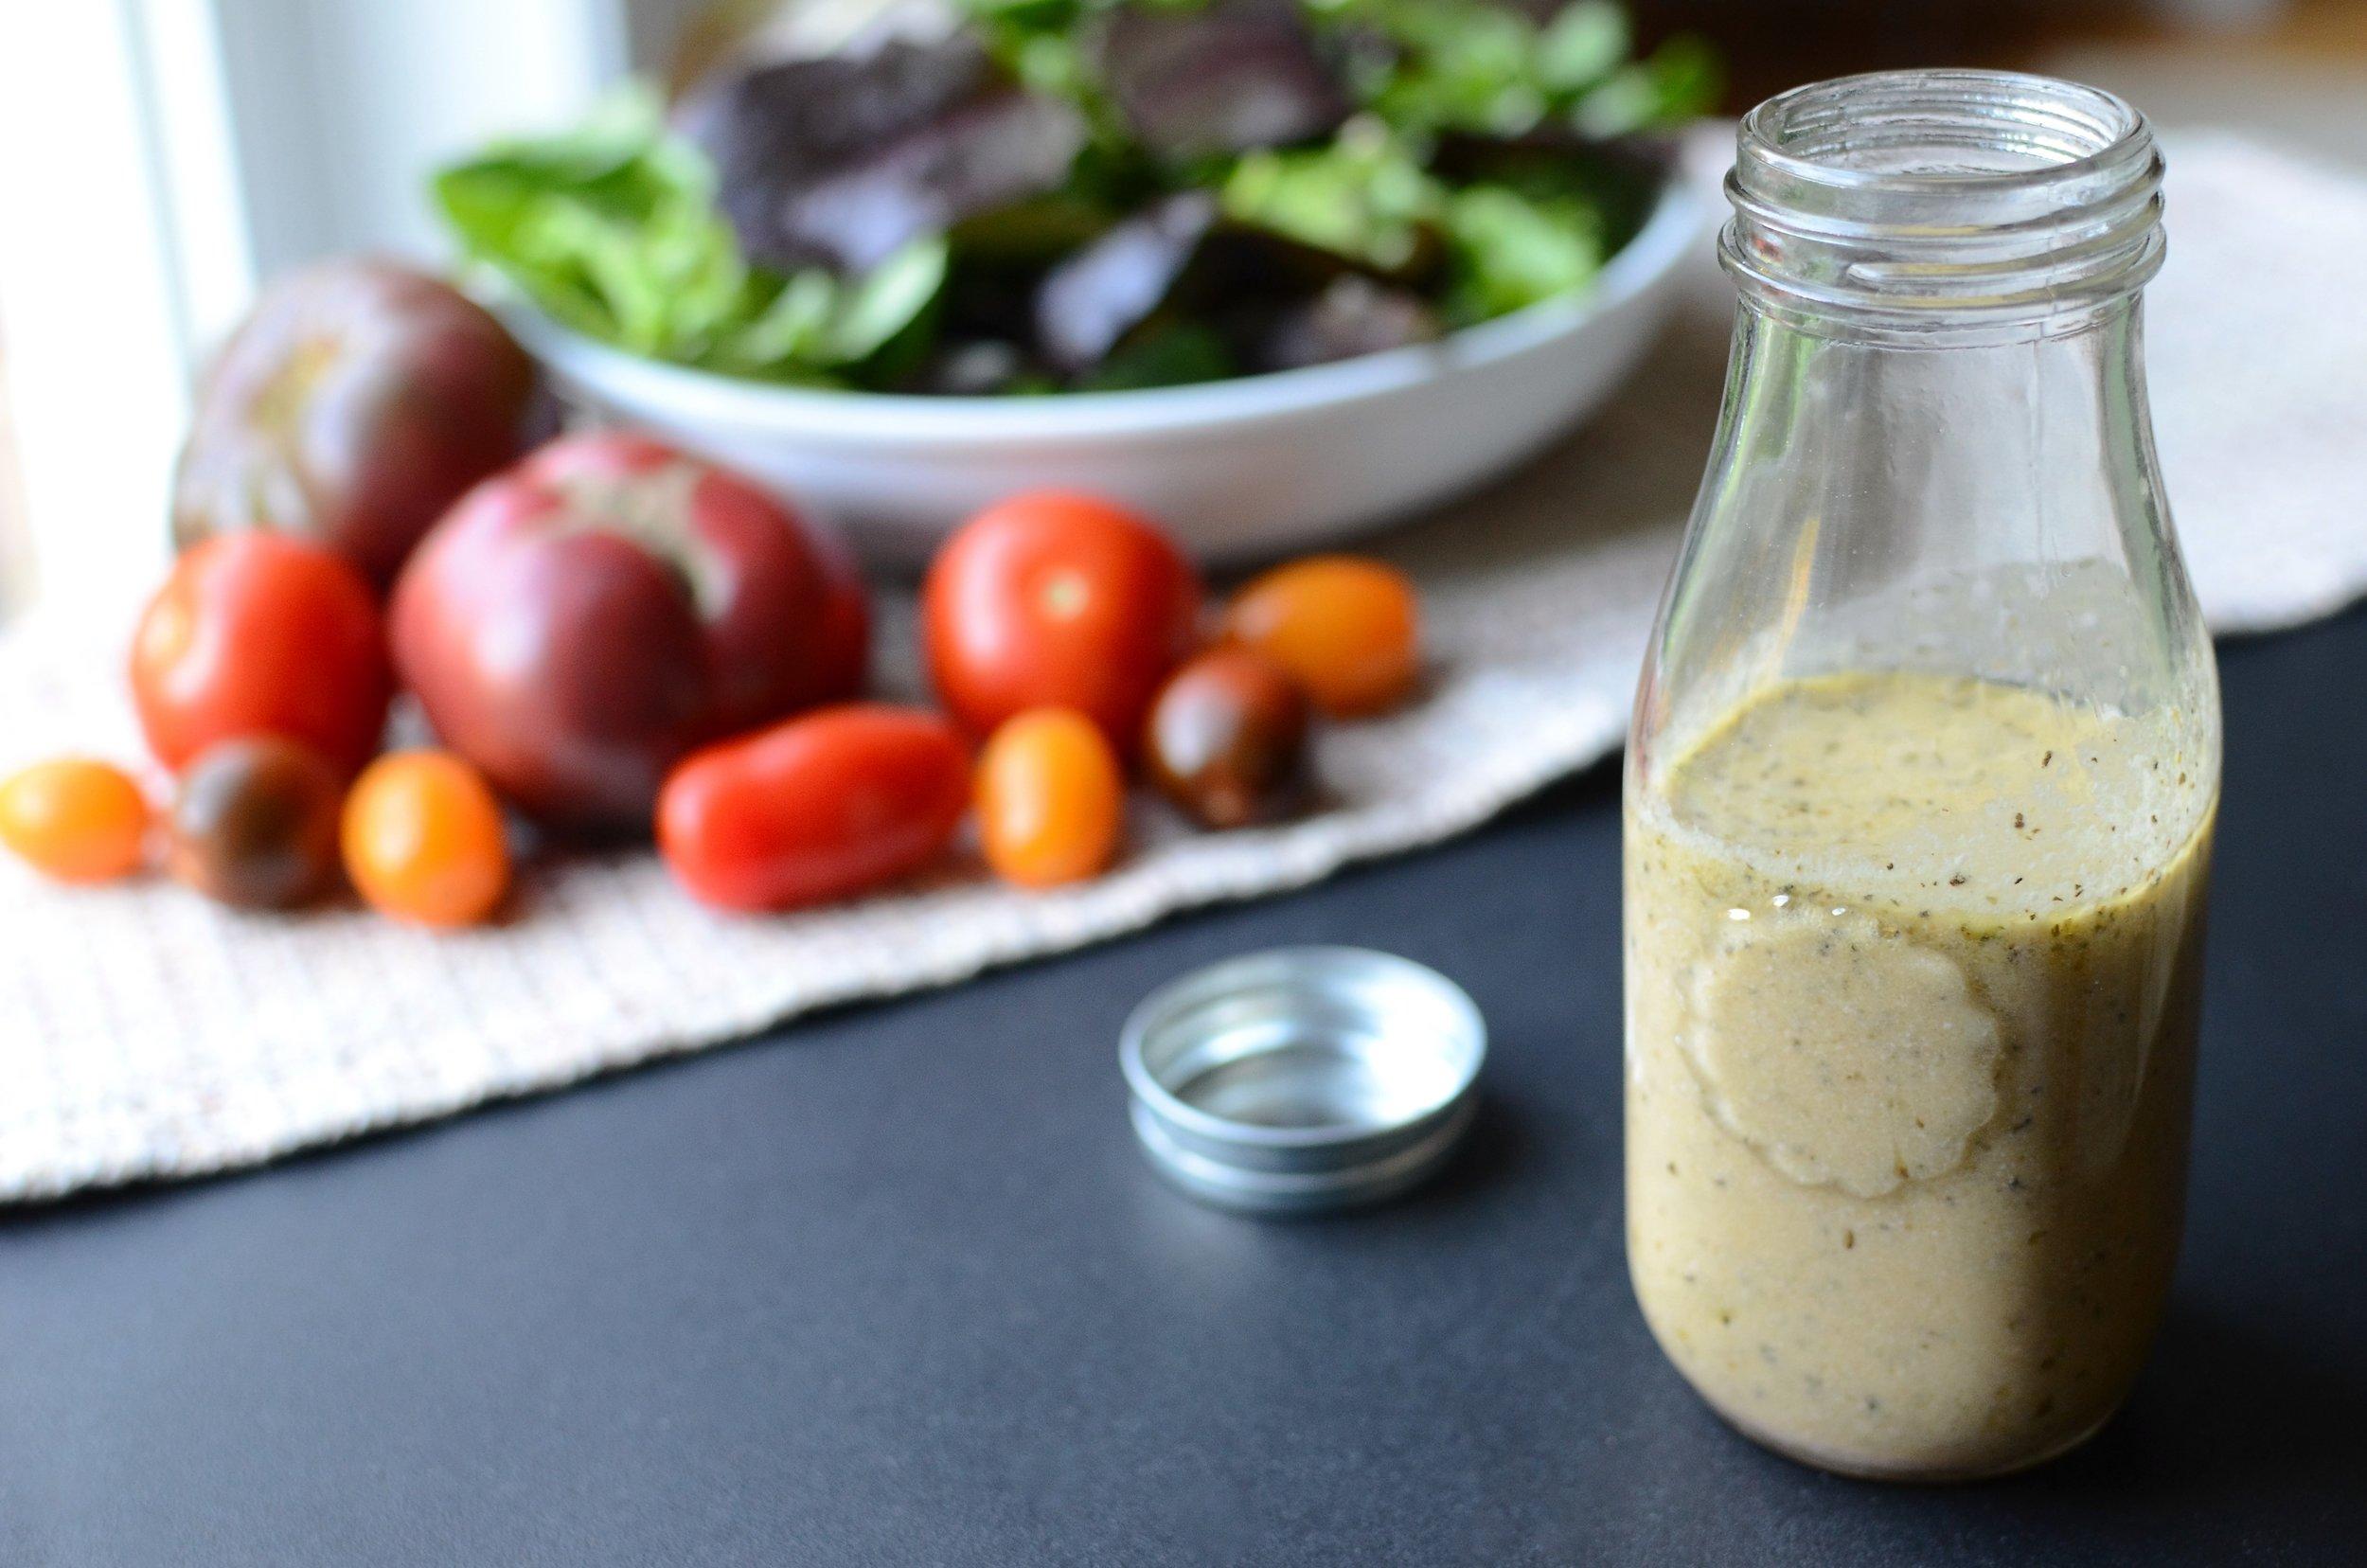 Creamy Greek Salad Dressing - ButterYum, Keto-friendly salad dressing. how to make Greek salad dressing. salad dressing with feta cheese. greek salad dressing recipe. creamy salad dressing recipes.